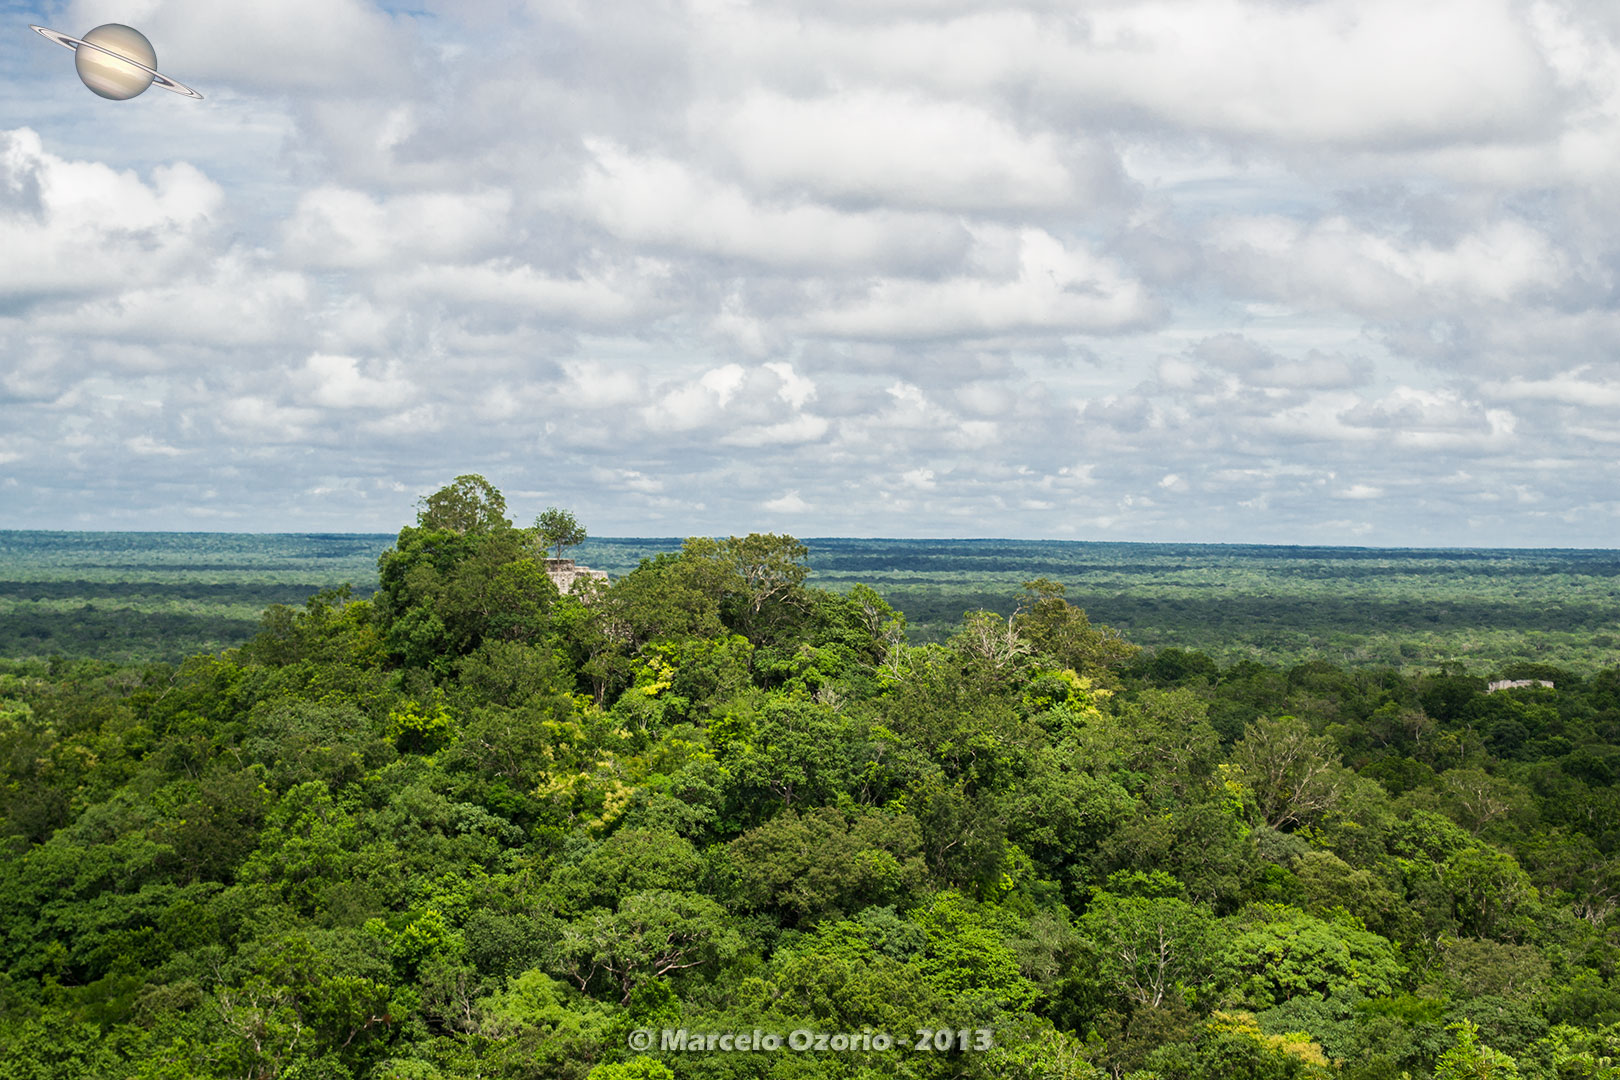 calakmul mayan civilization mexico 31 - Calakmul, City of the Two Adjacent Pyramids - Mexico